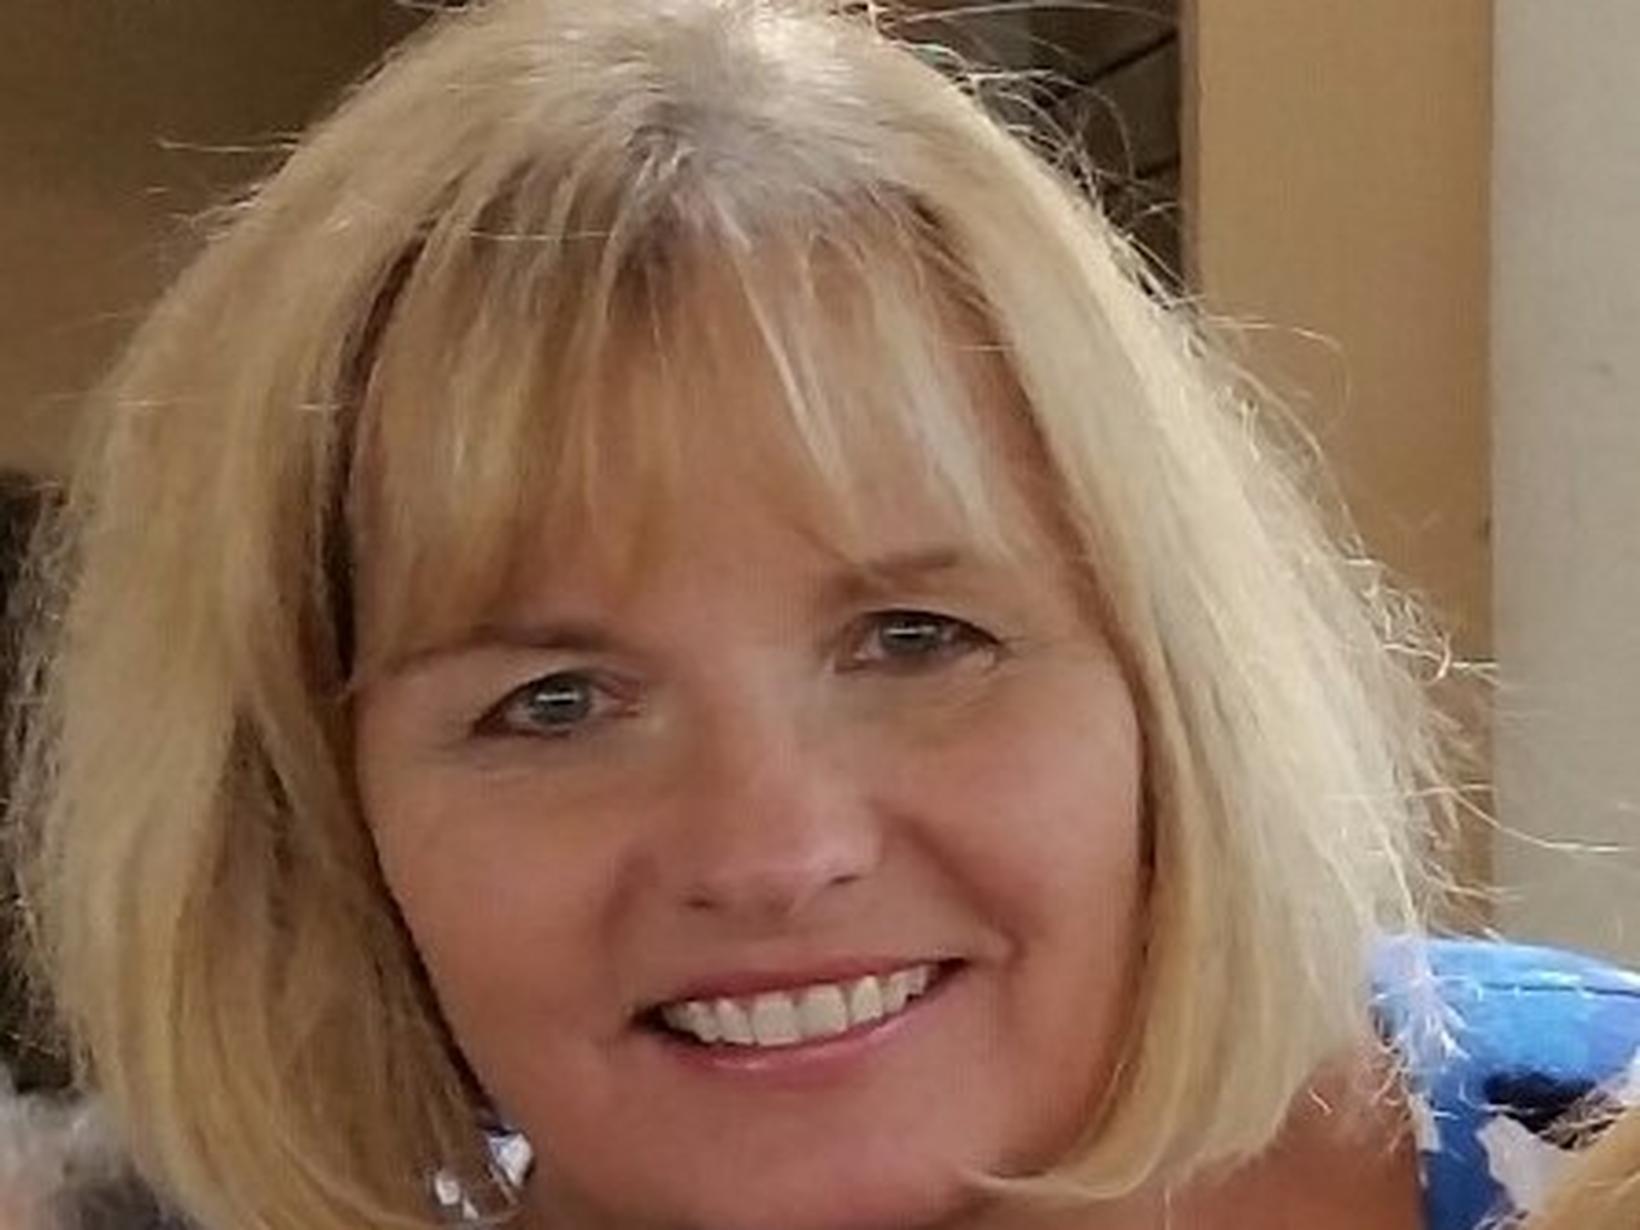 Barbara from Chandler, Arizona, United States